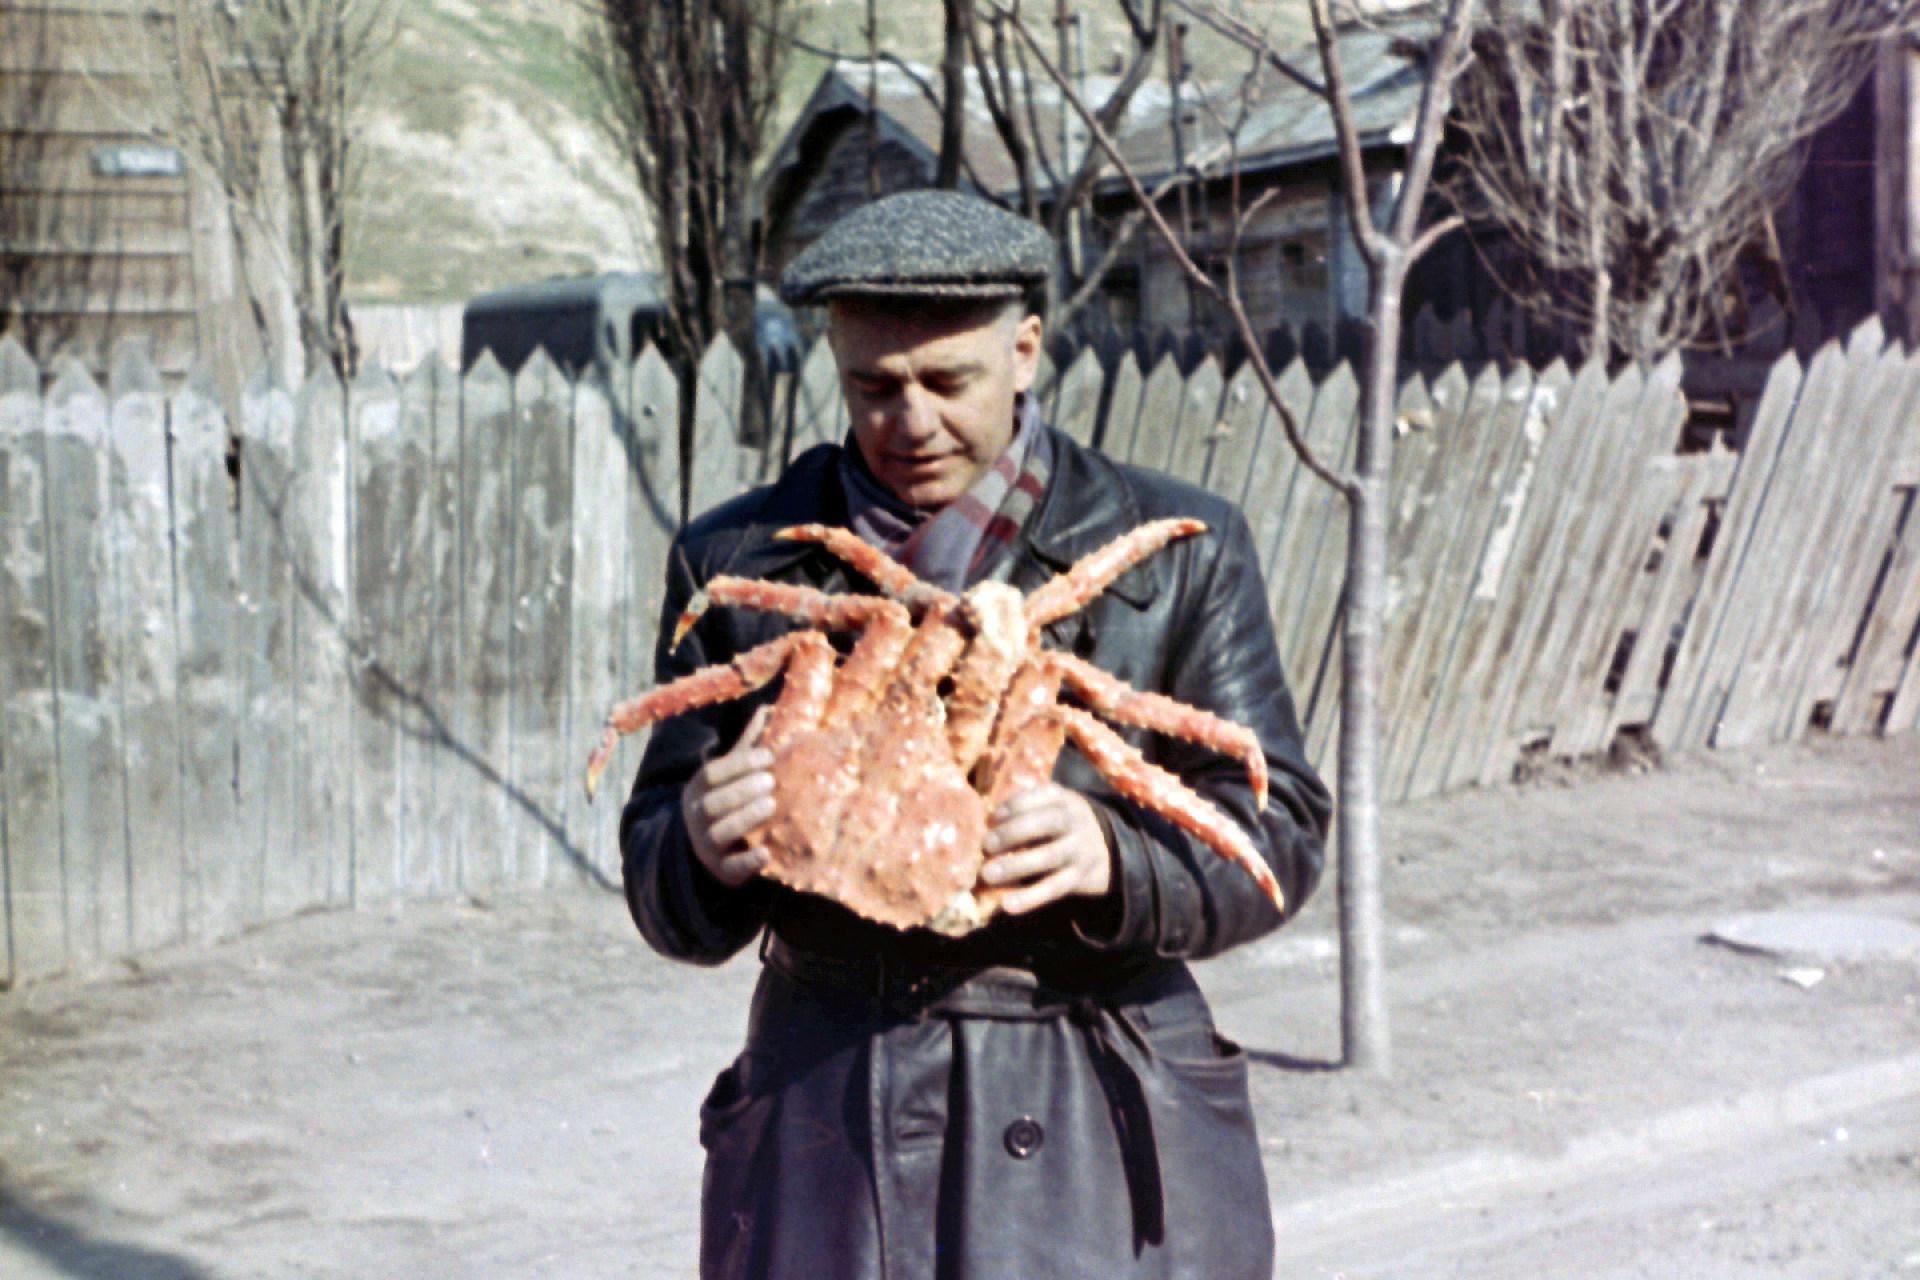 Экспонат #121. Марк Антонович Трояновский. Сахалин. 1950 год